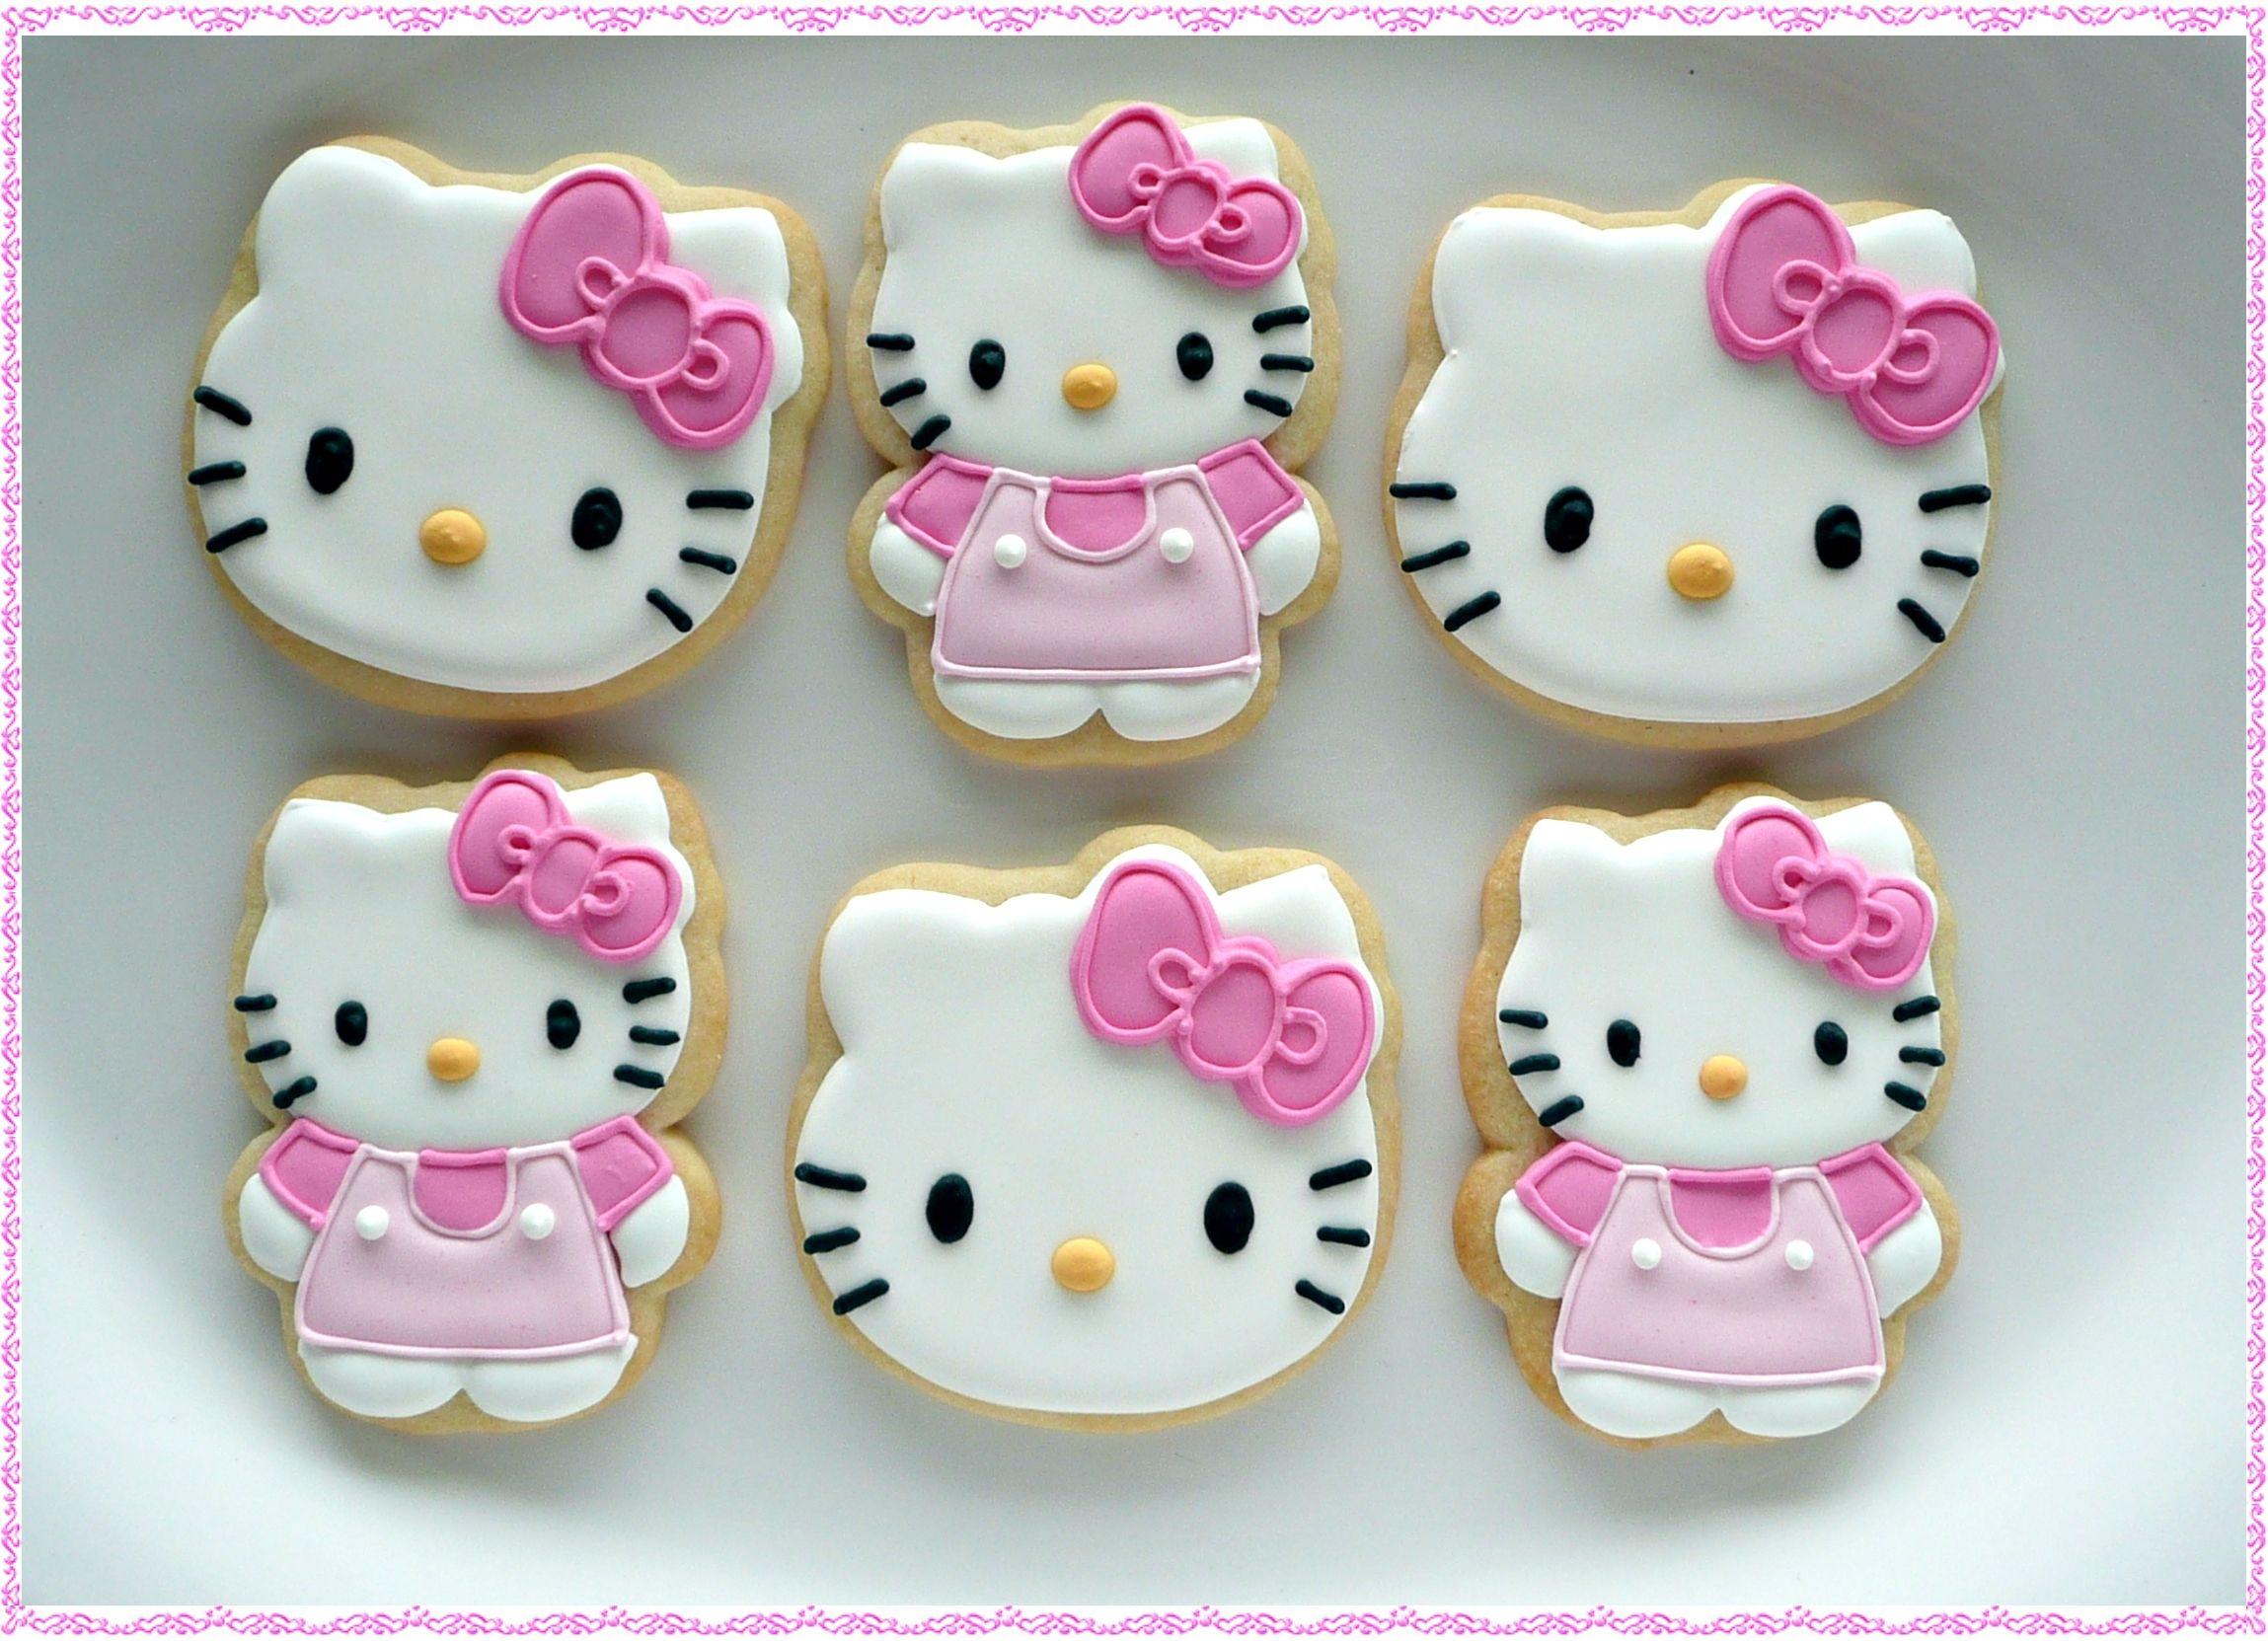 Helly Kitty Cookies Hello Kitty Cookies Hello Kitty Cake Hello Kitty Birthday Party